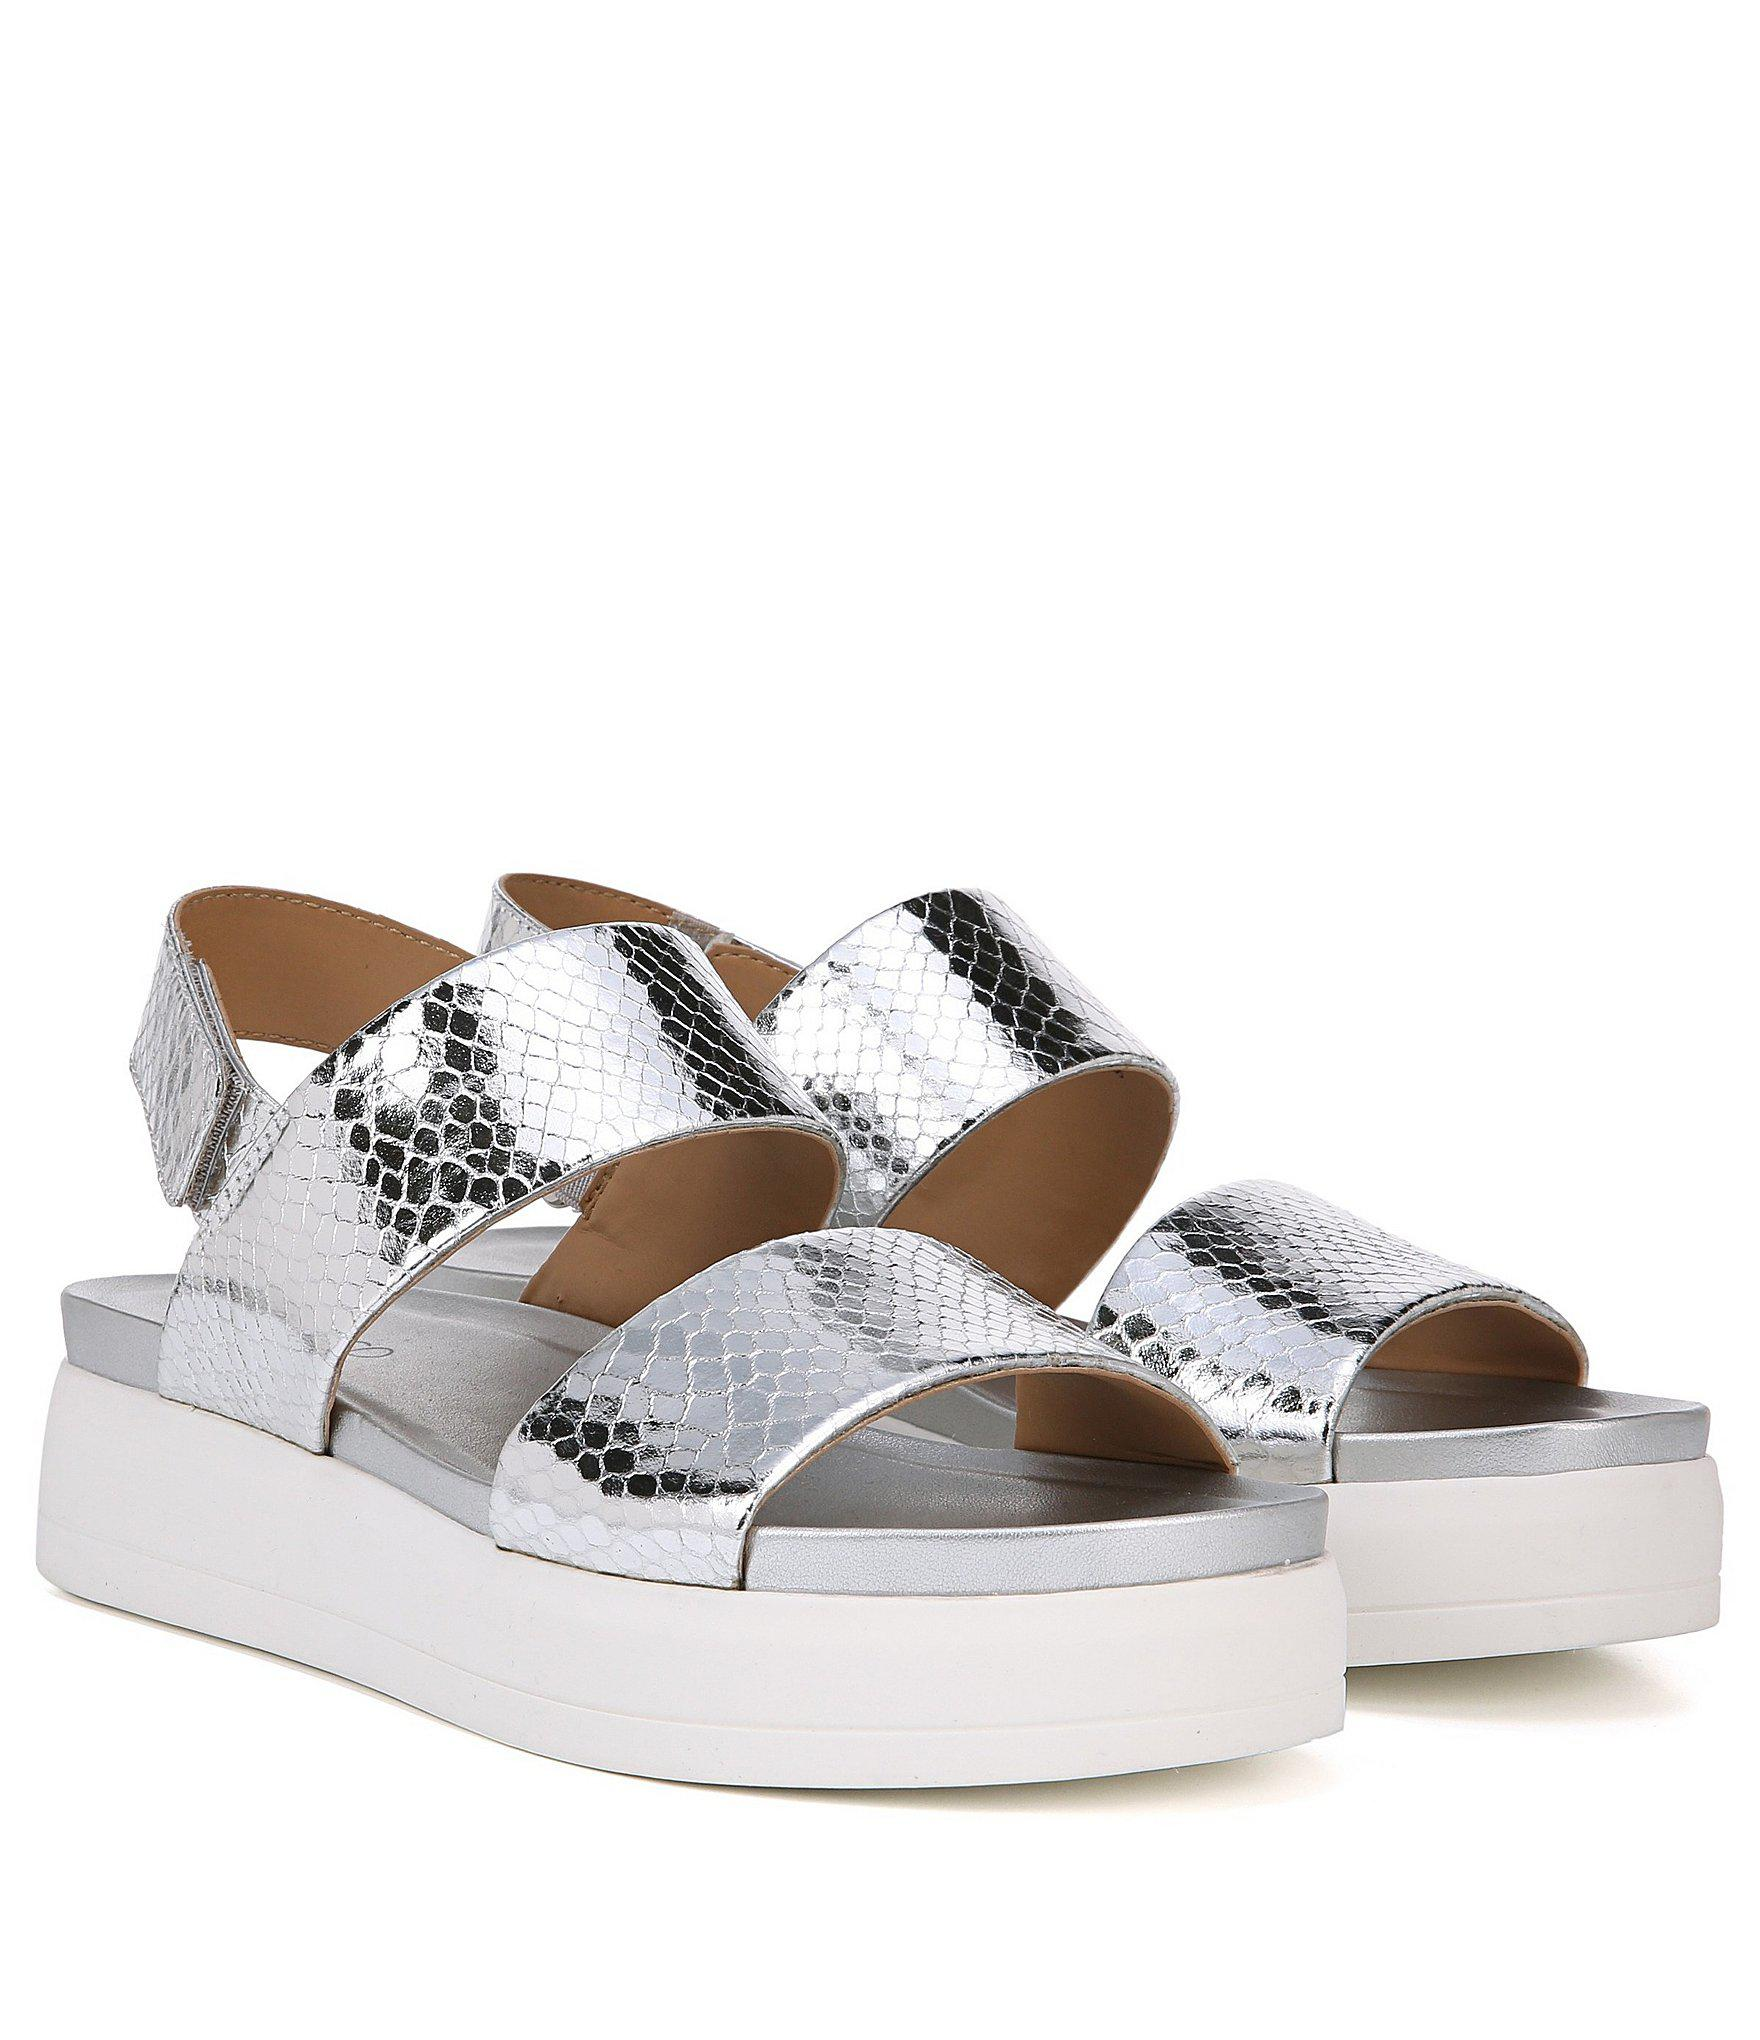 2e341f33a70 Lyst - Franco Sarto Kenan Metallic Snake Print Platform Sandals in ...